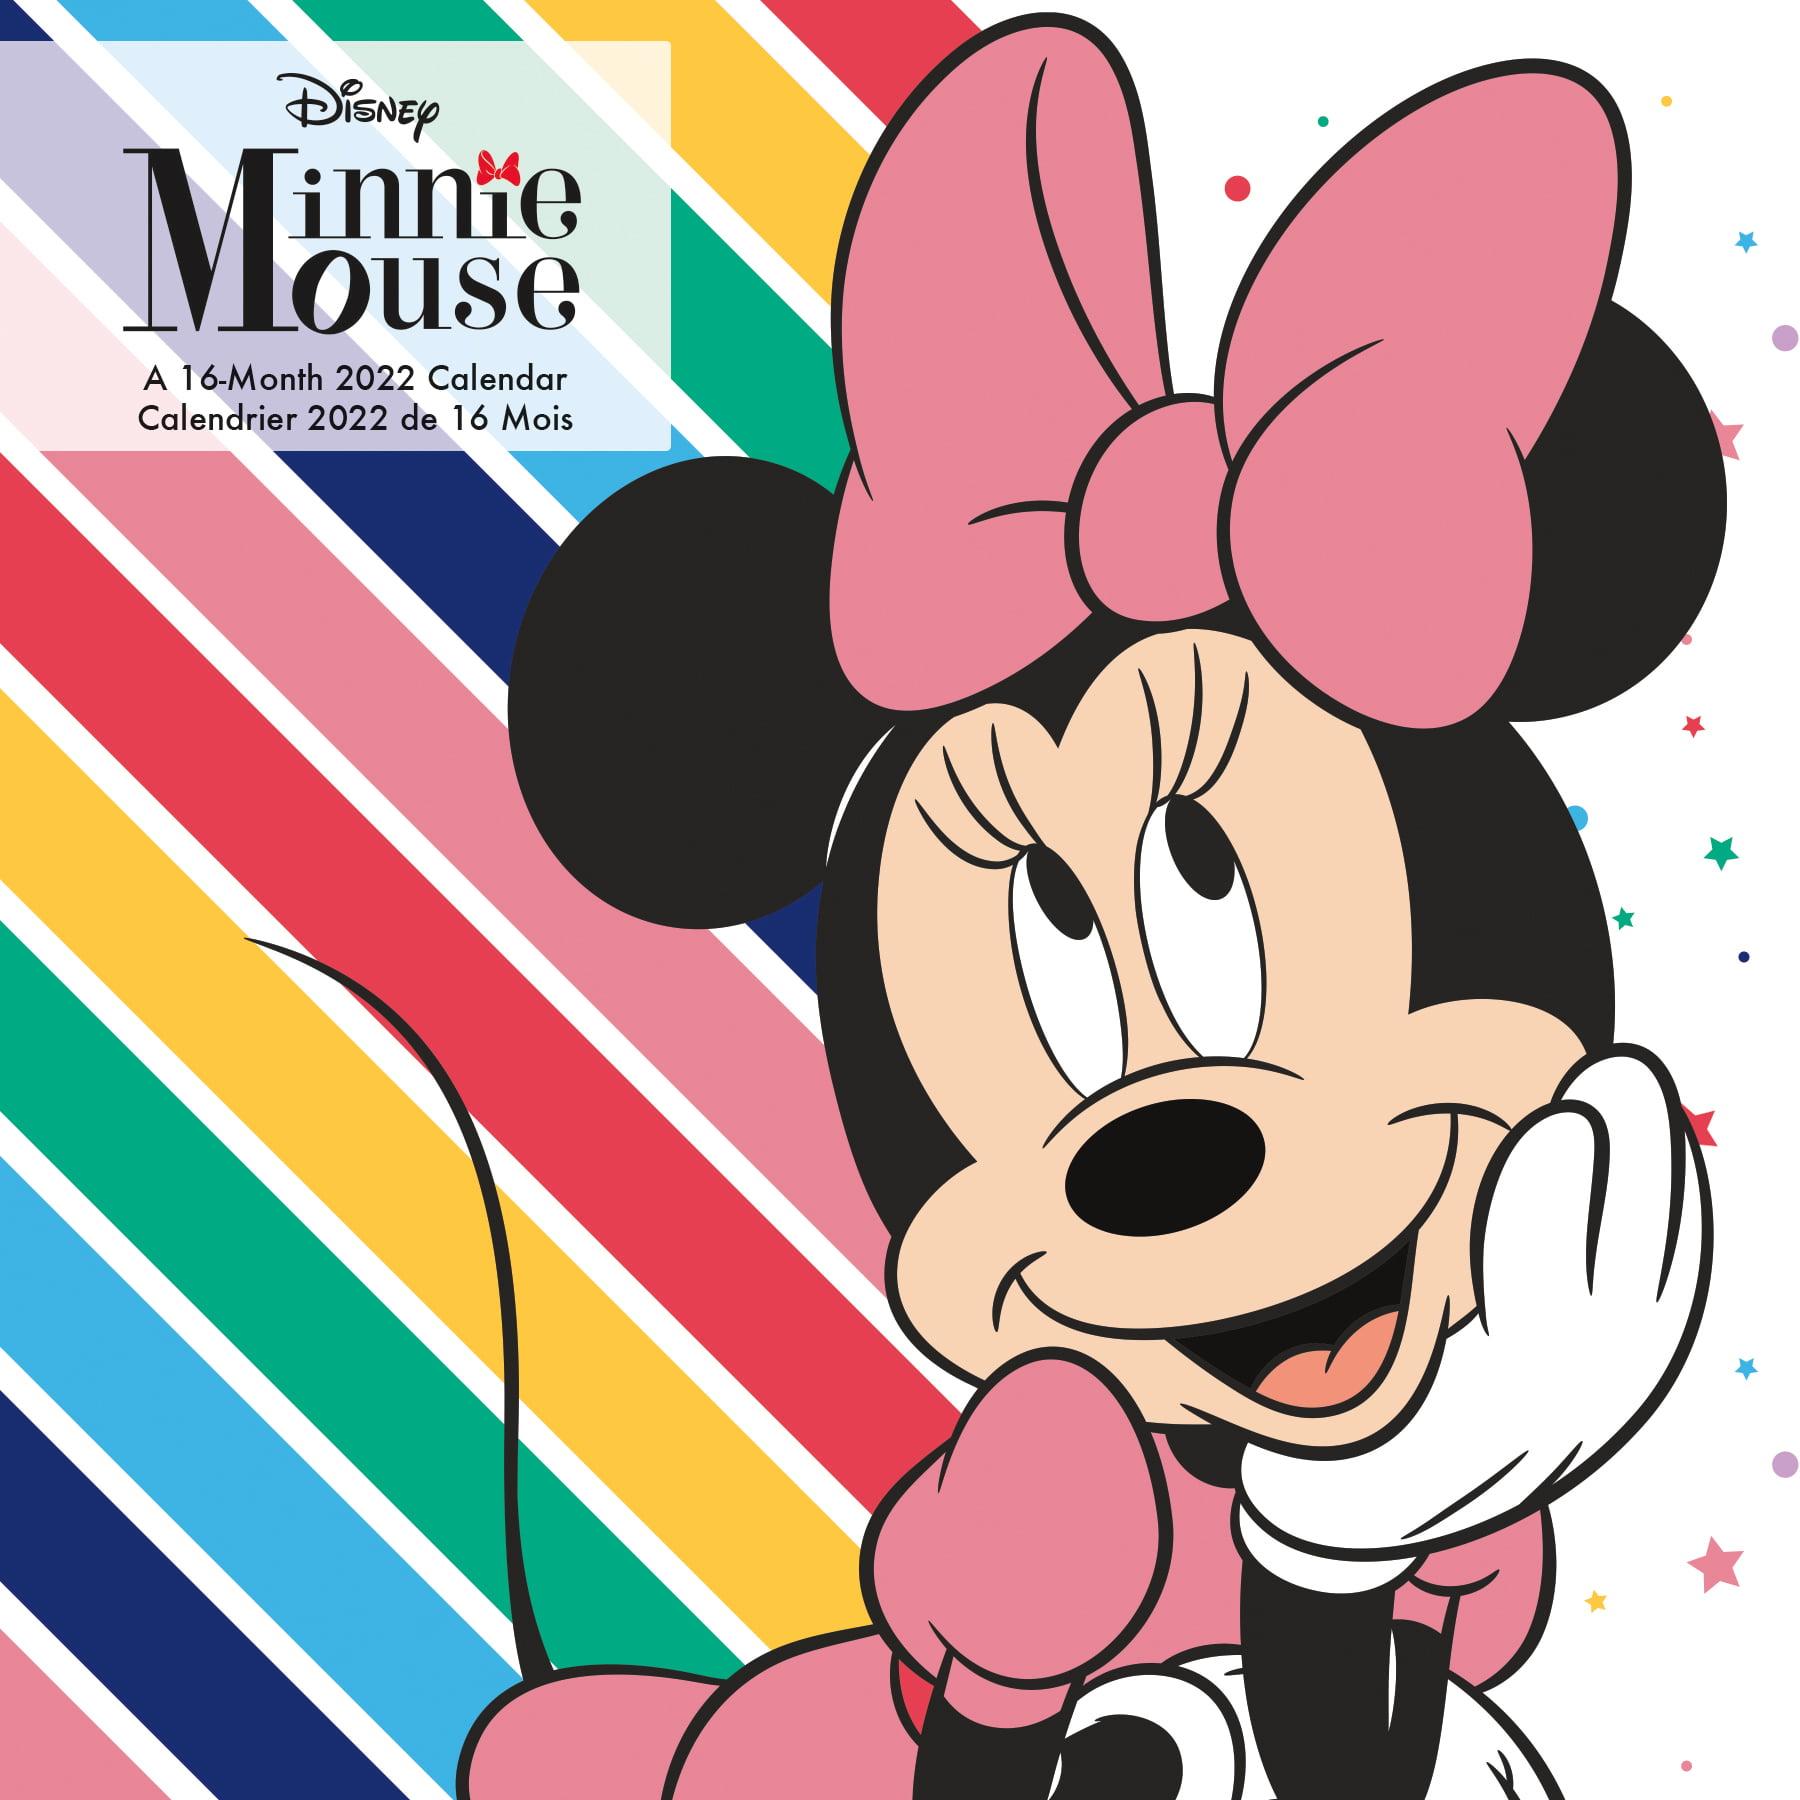 Calendrier Ultra Trail 2022 France 2022 Disney Minnie Mouse (Bilingual French) Wall Calendar